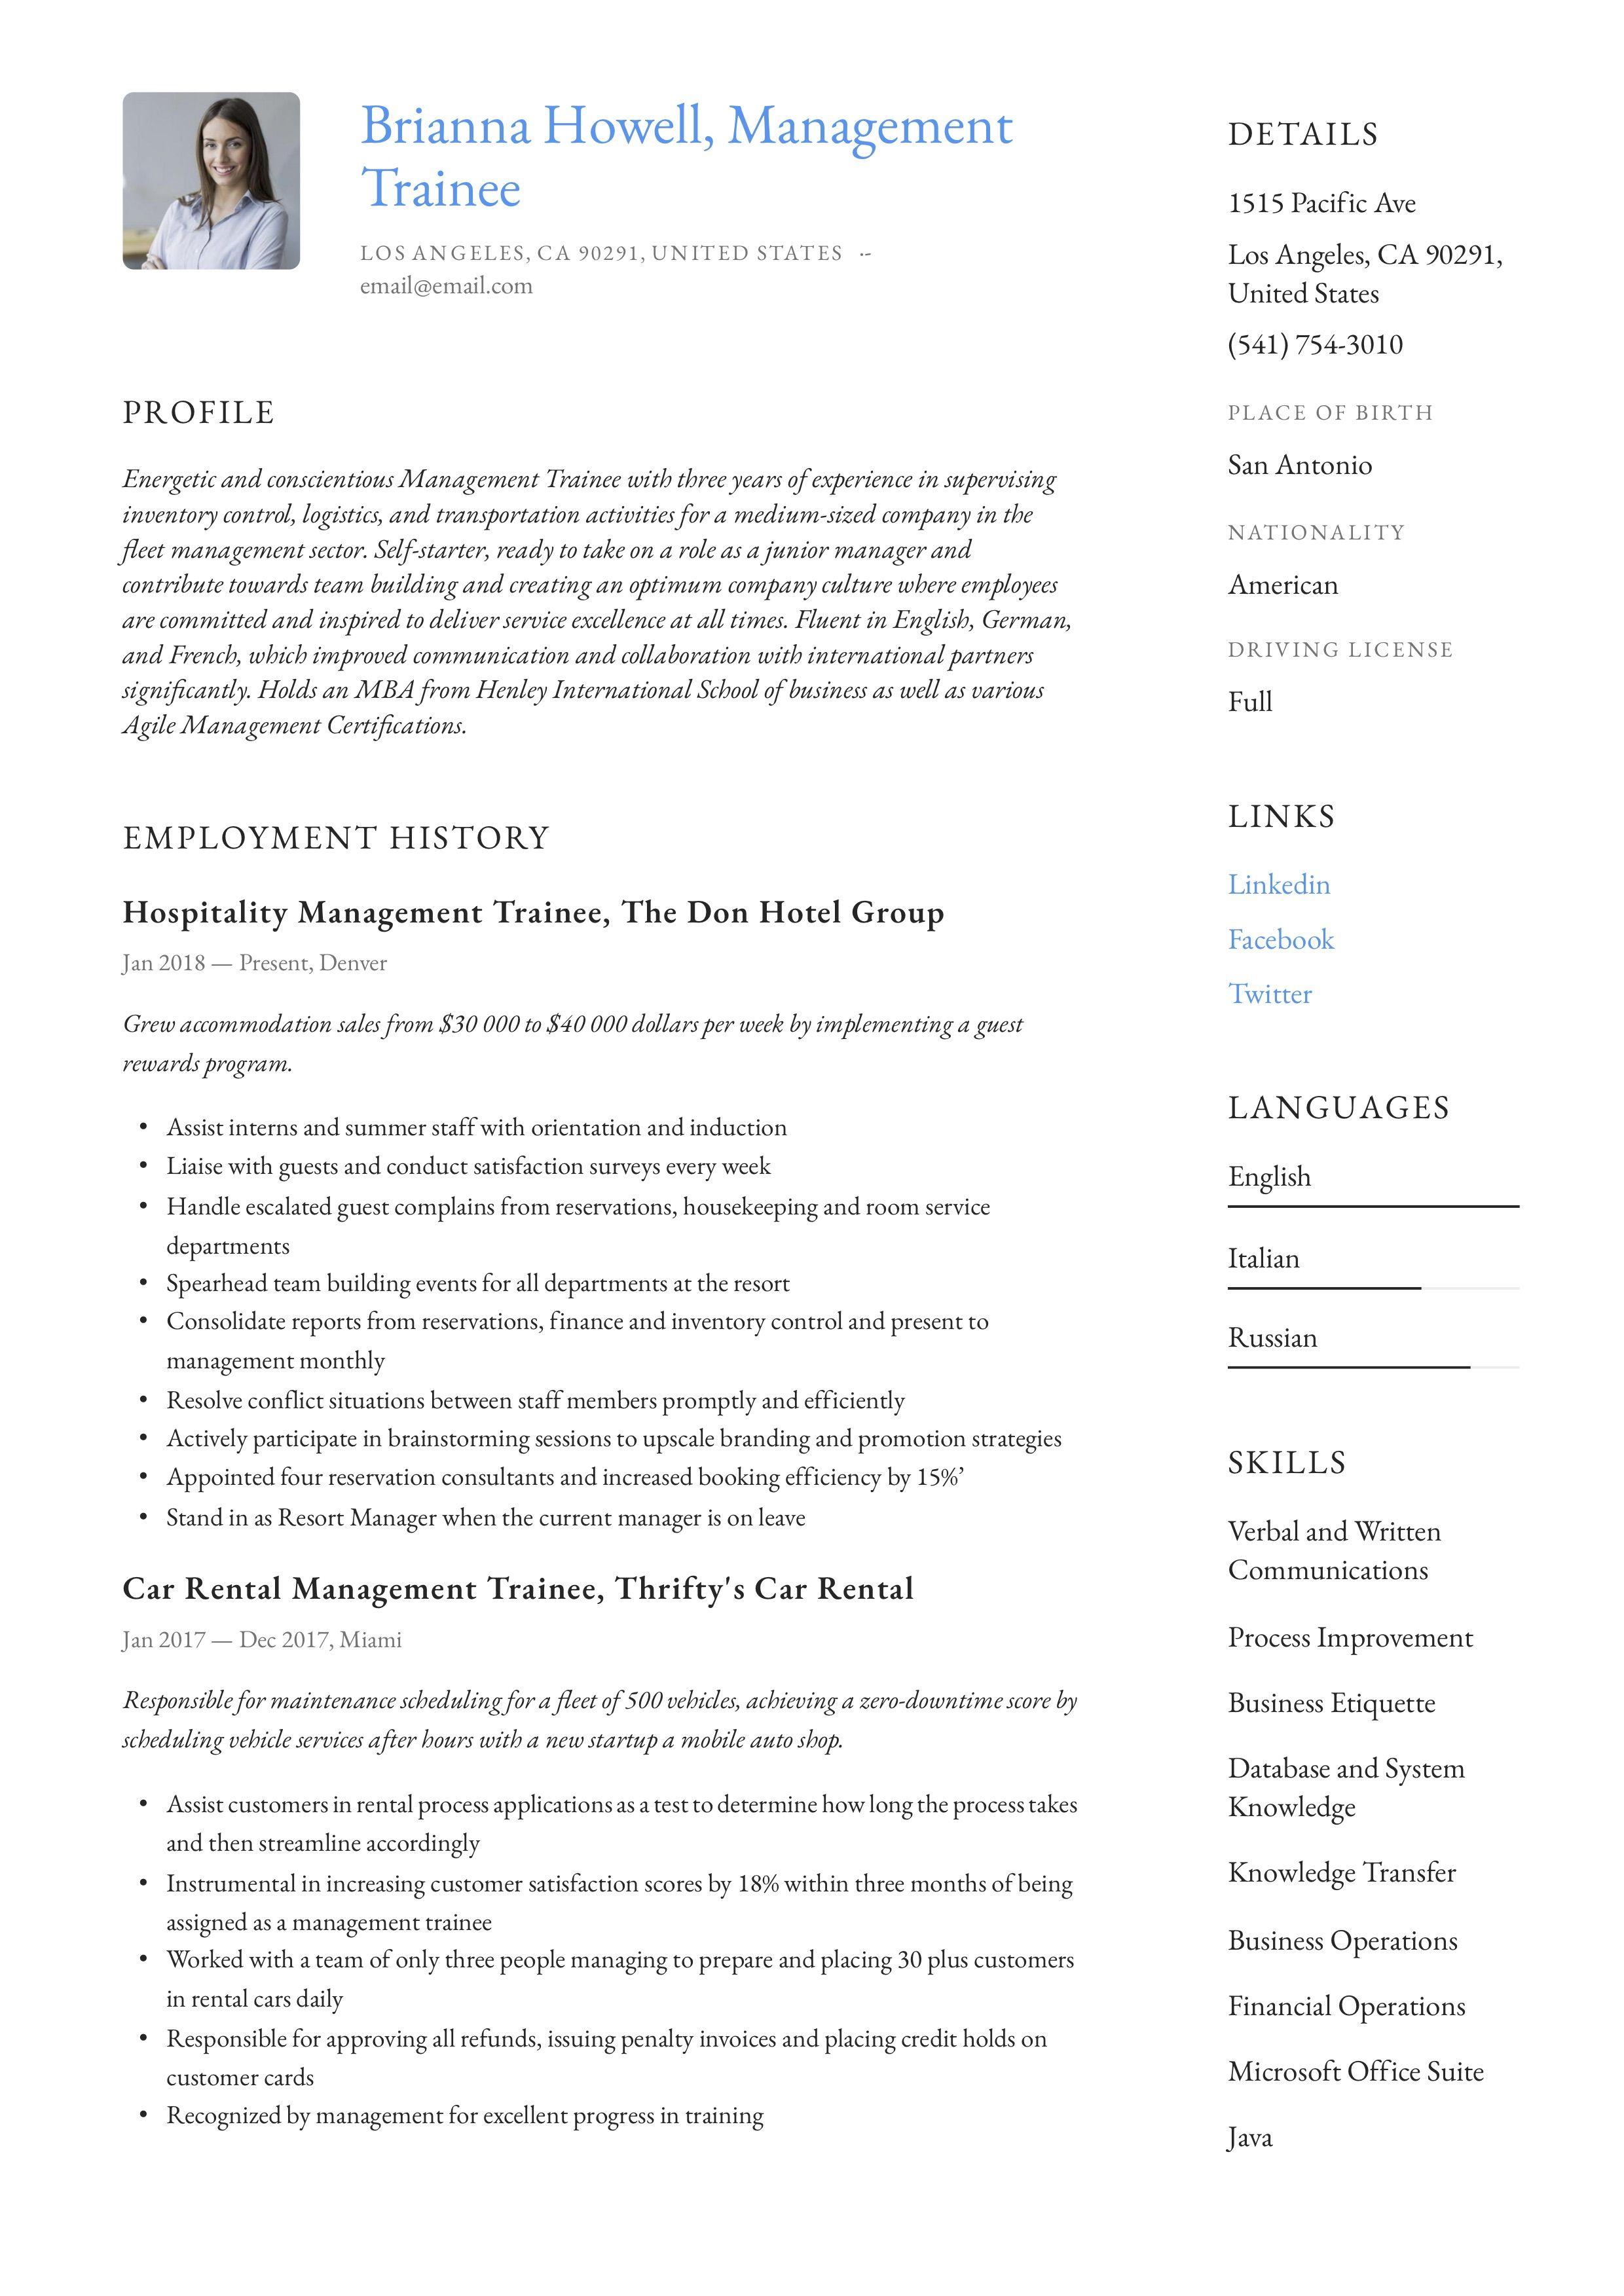 Modern Management Trainee Resume, template, design, tips